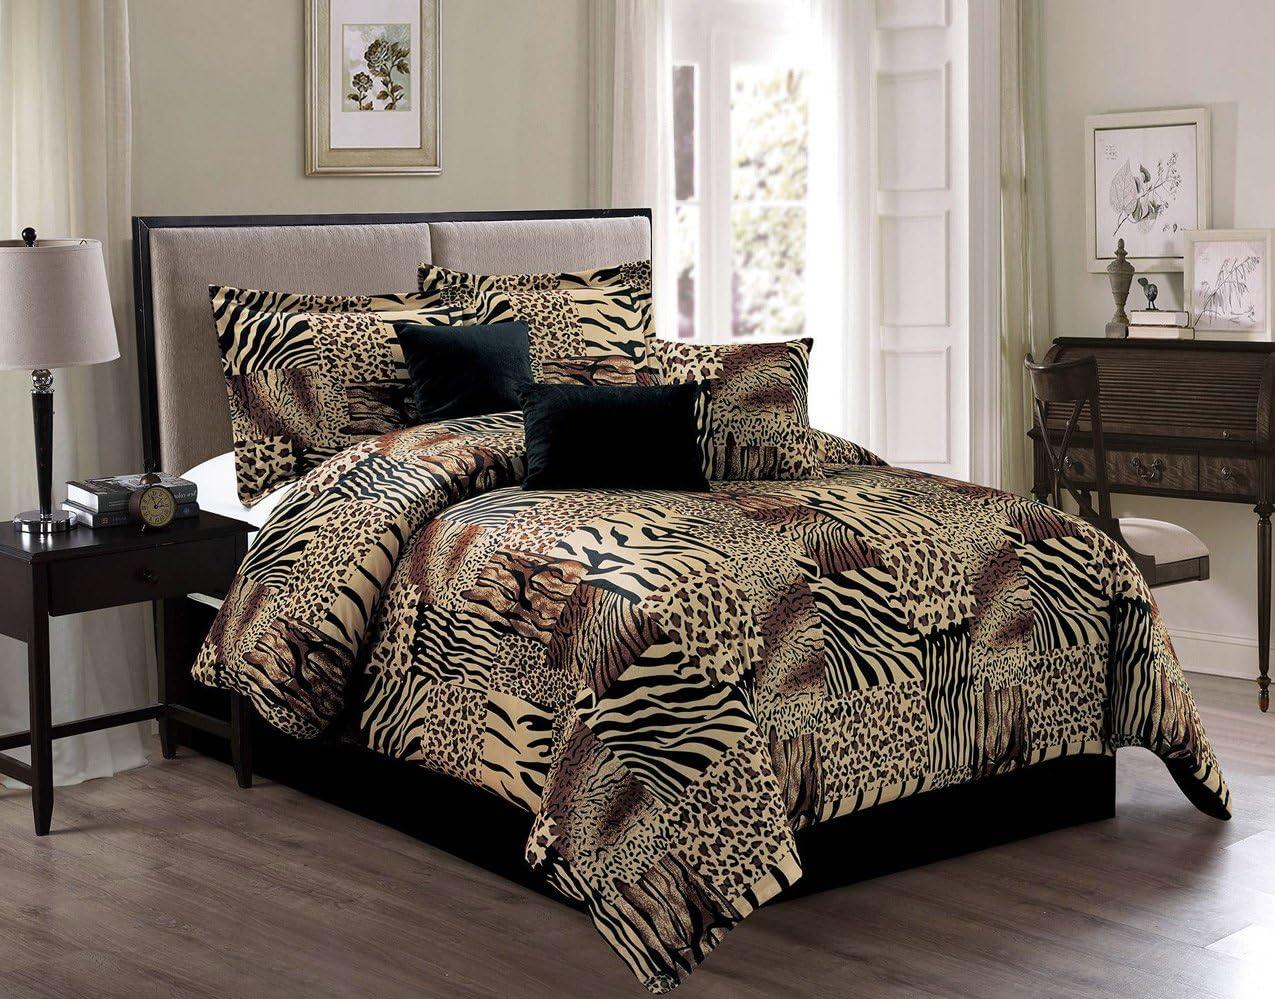 7 Piece KING Safari Micro Fur Comforter set - Zebra, Giraffe, Leopard, Tiger Etc - Multi Animal Print Bed in a Bag Brown Beige Black White Bedding